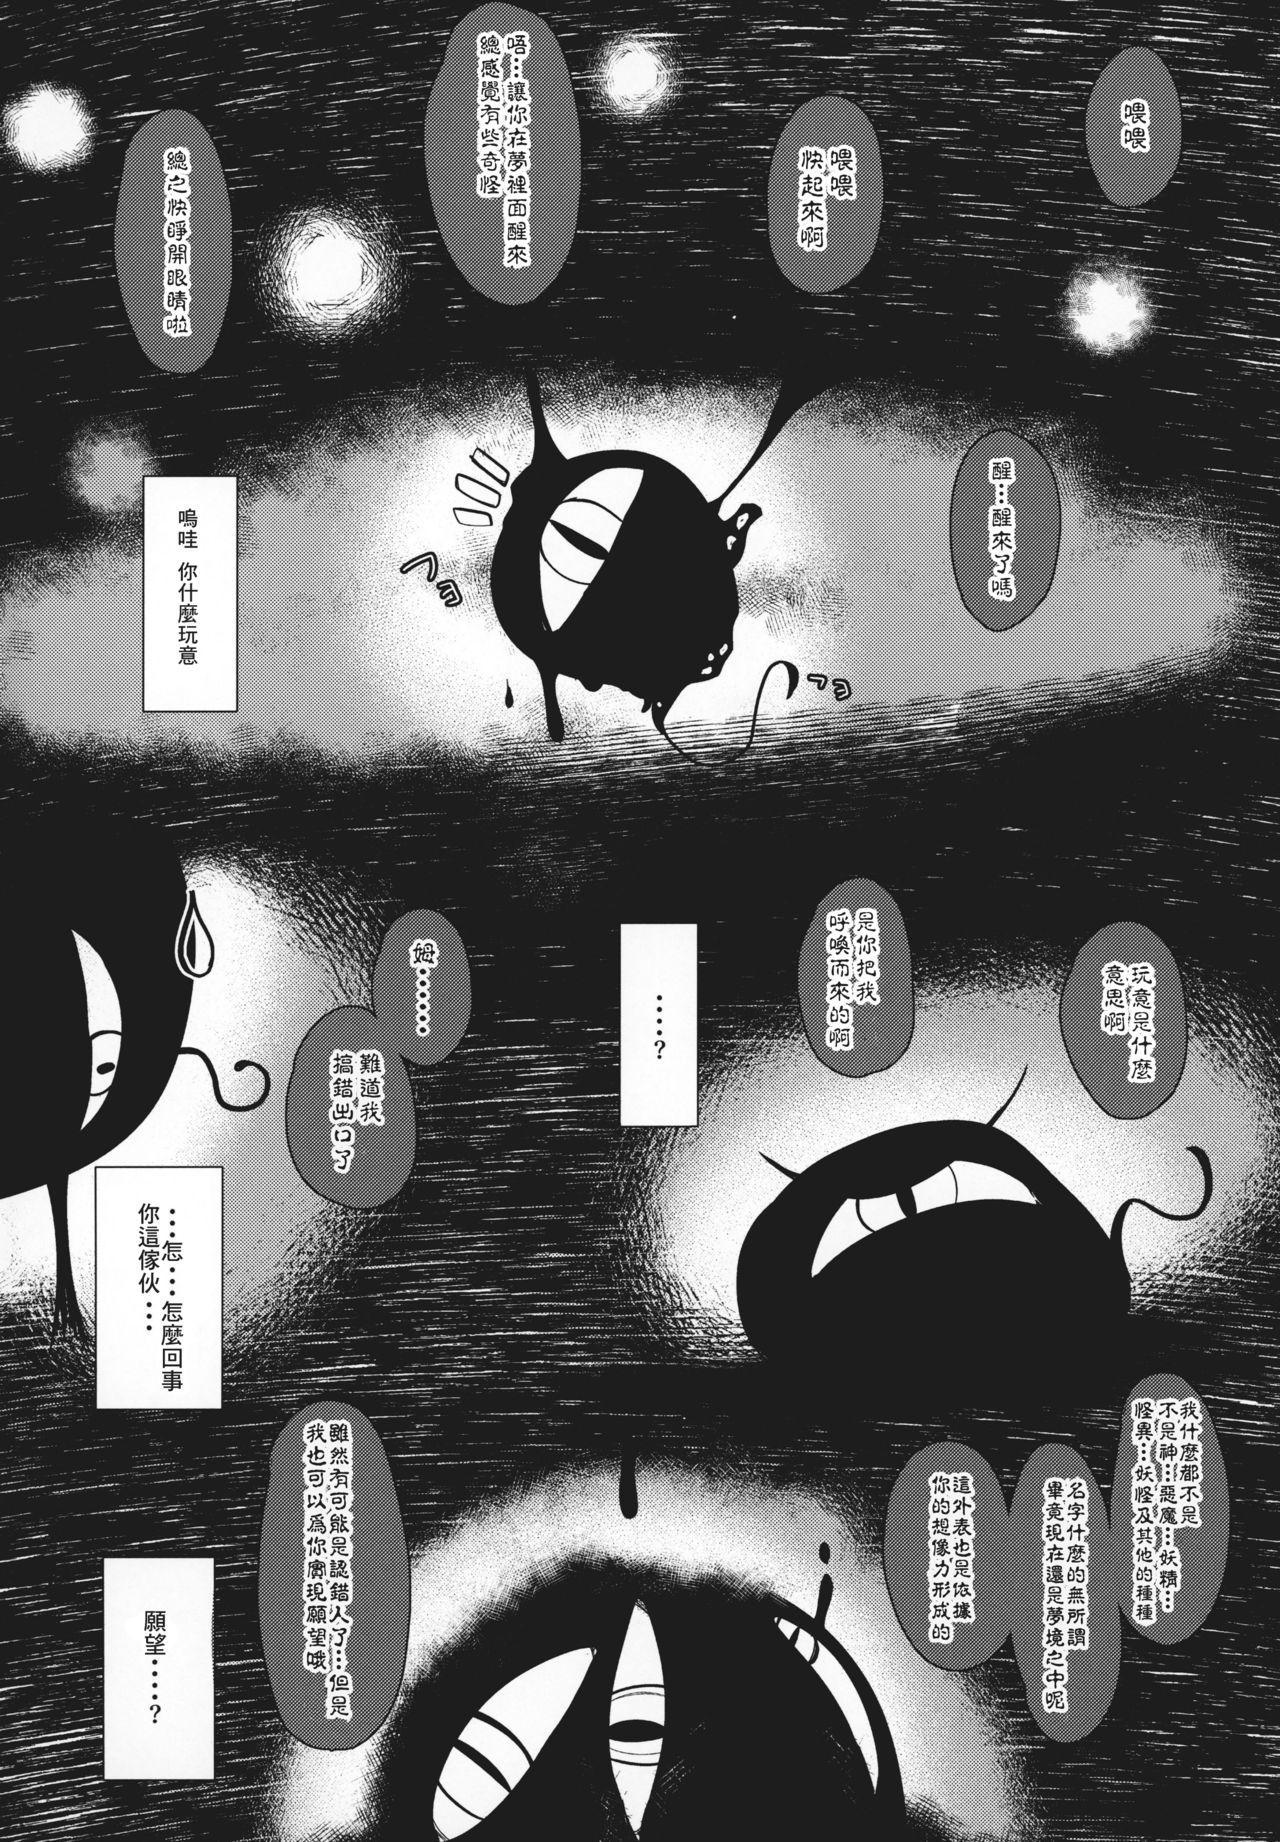 (COMITIA127) [Manpuchi (Nekodel)] Uro -Makuai- Kanwa [Chinese] [零食汉化组] 3